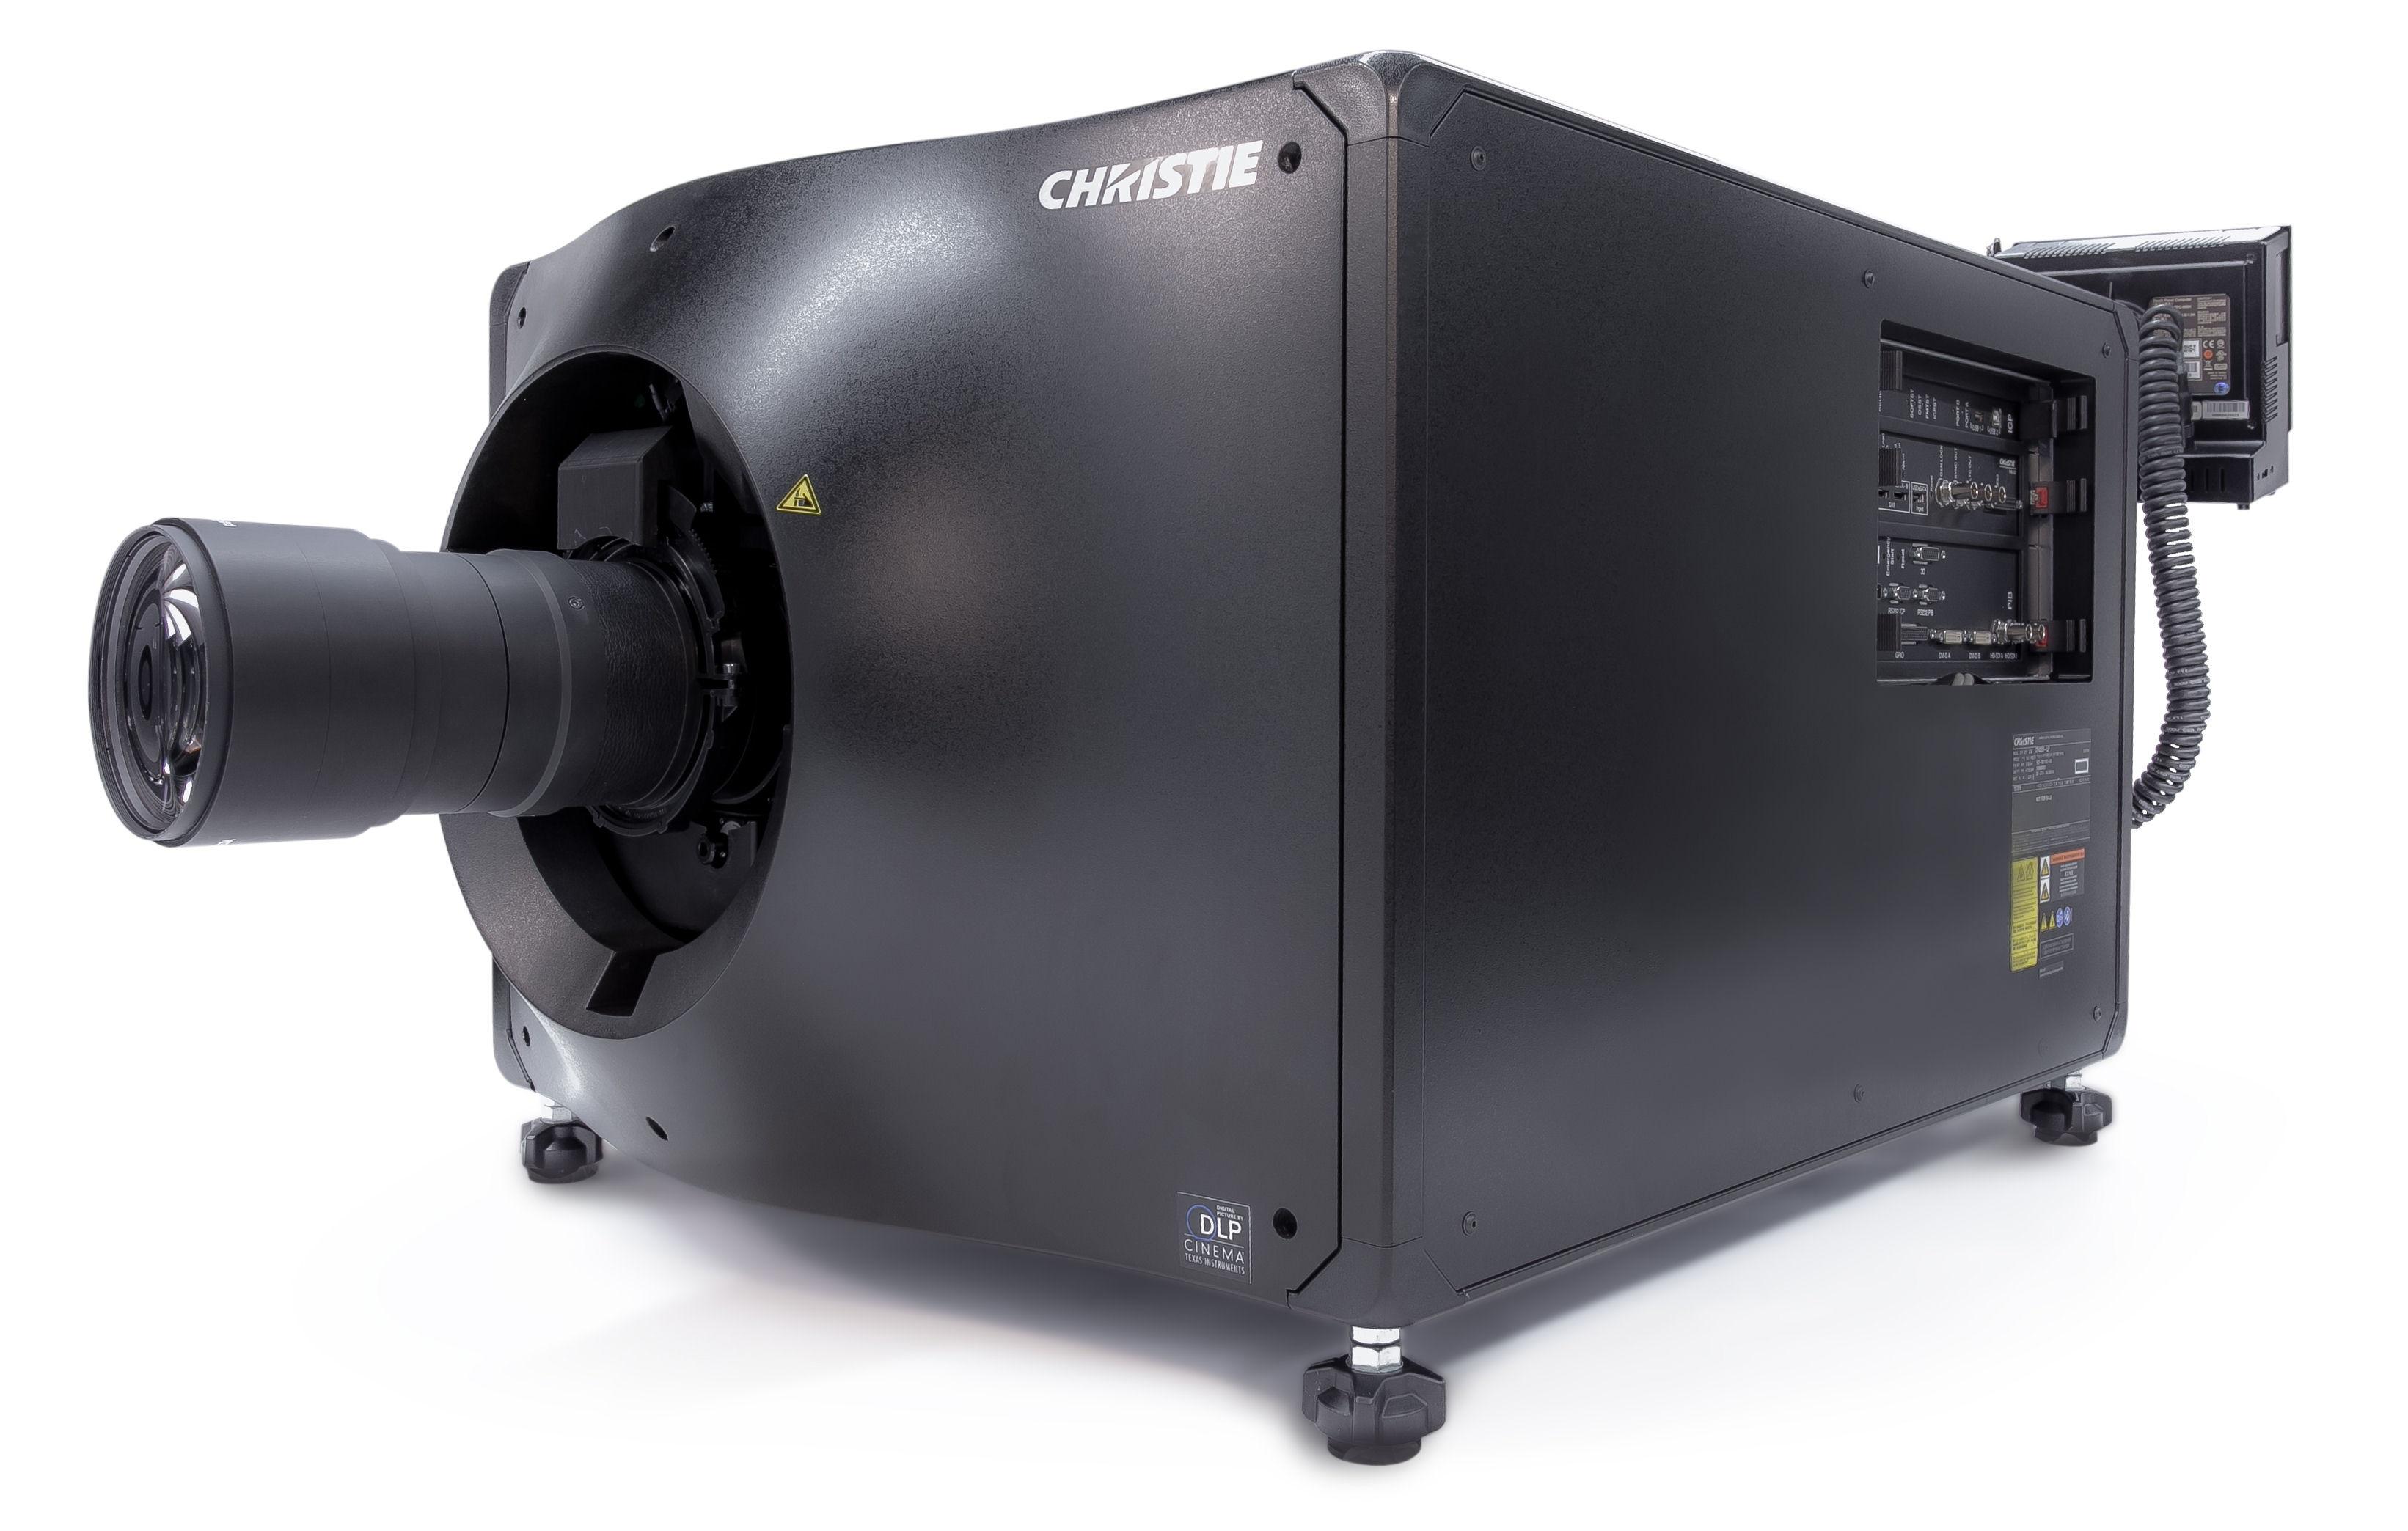 Christie CP4325-RGB